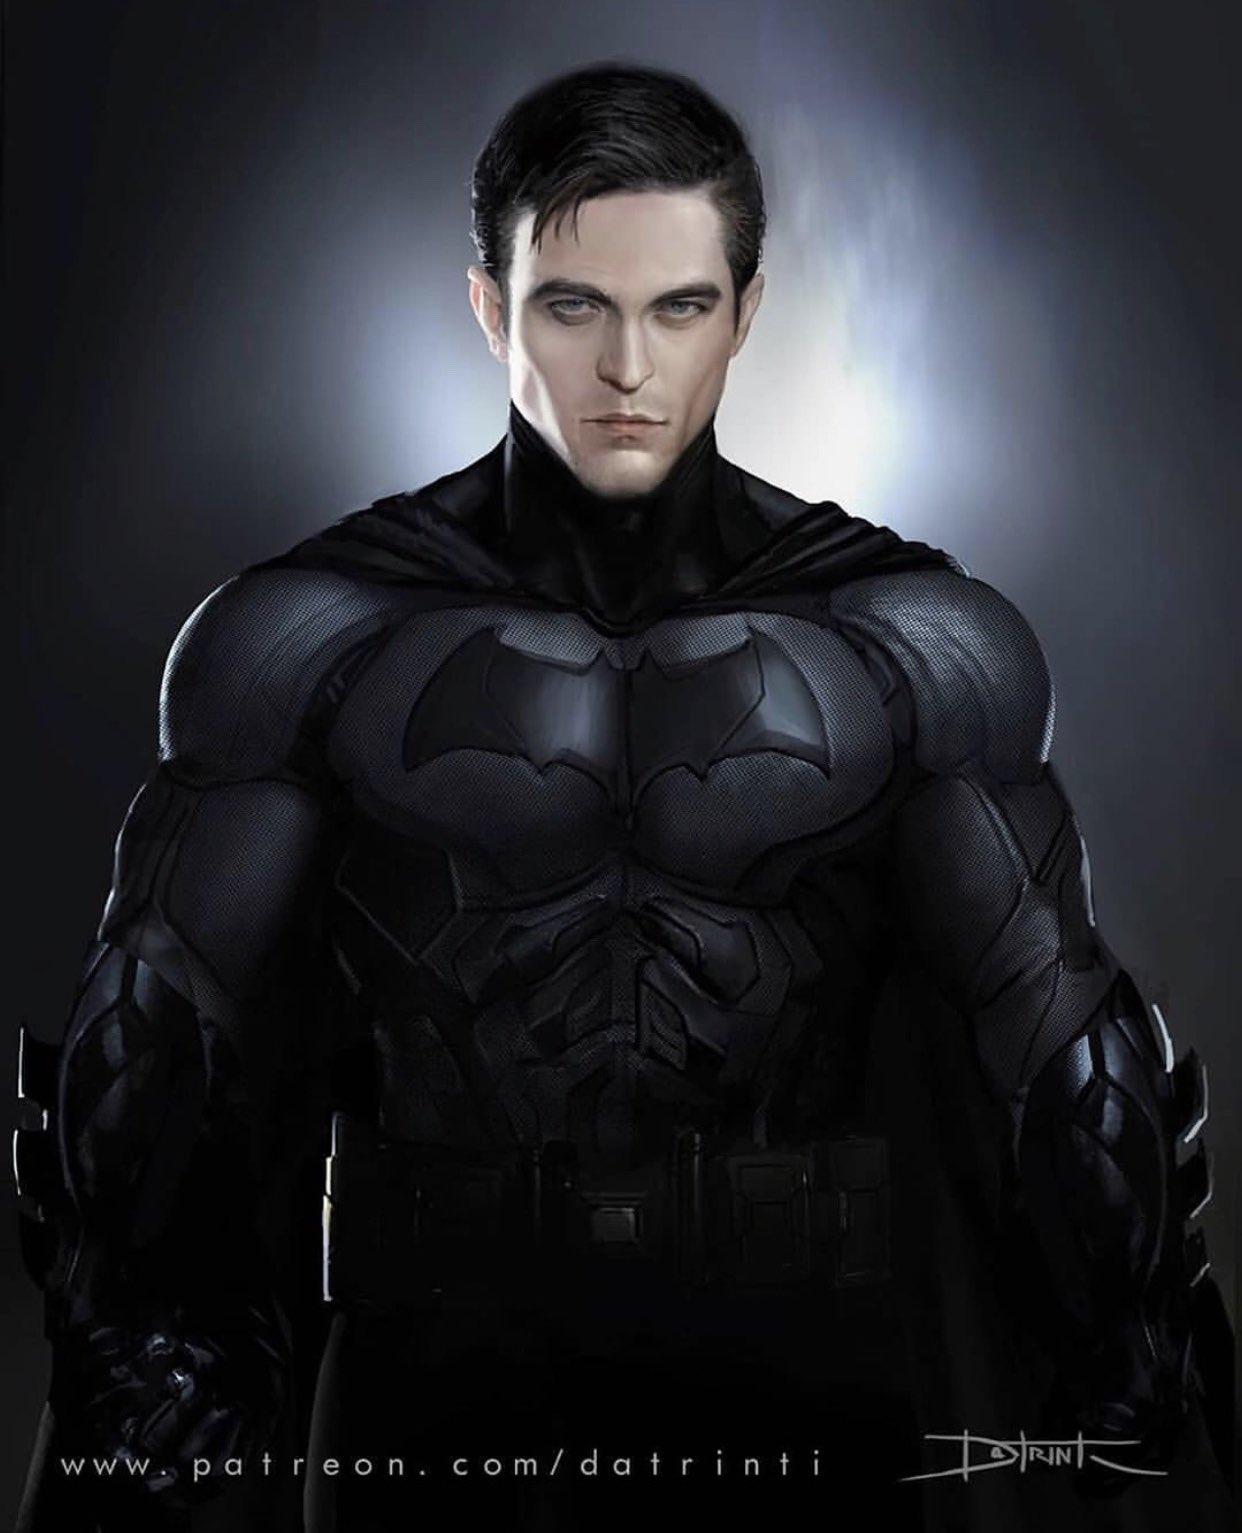 Robert Pattinson, Twilight Actor Is Officially, The New Batman